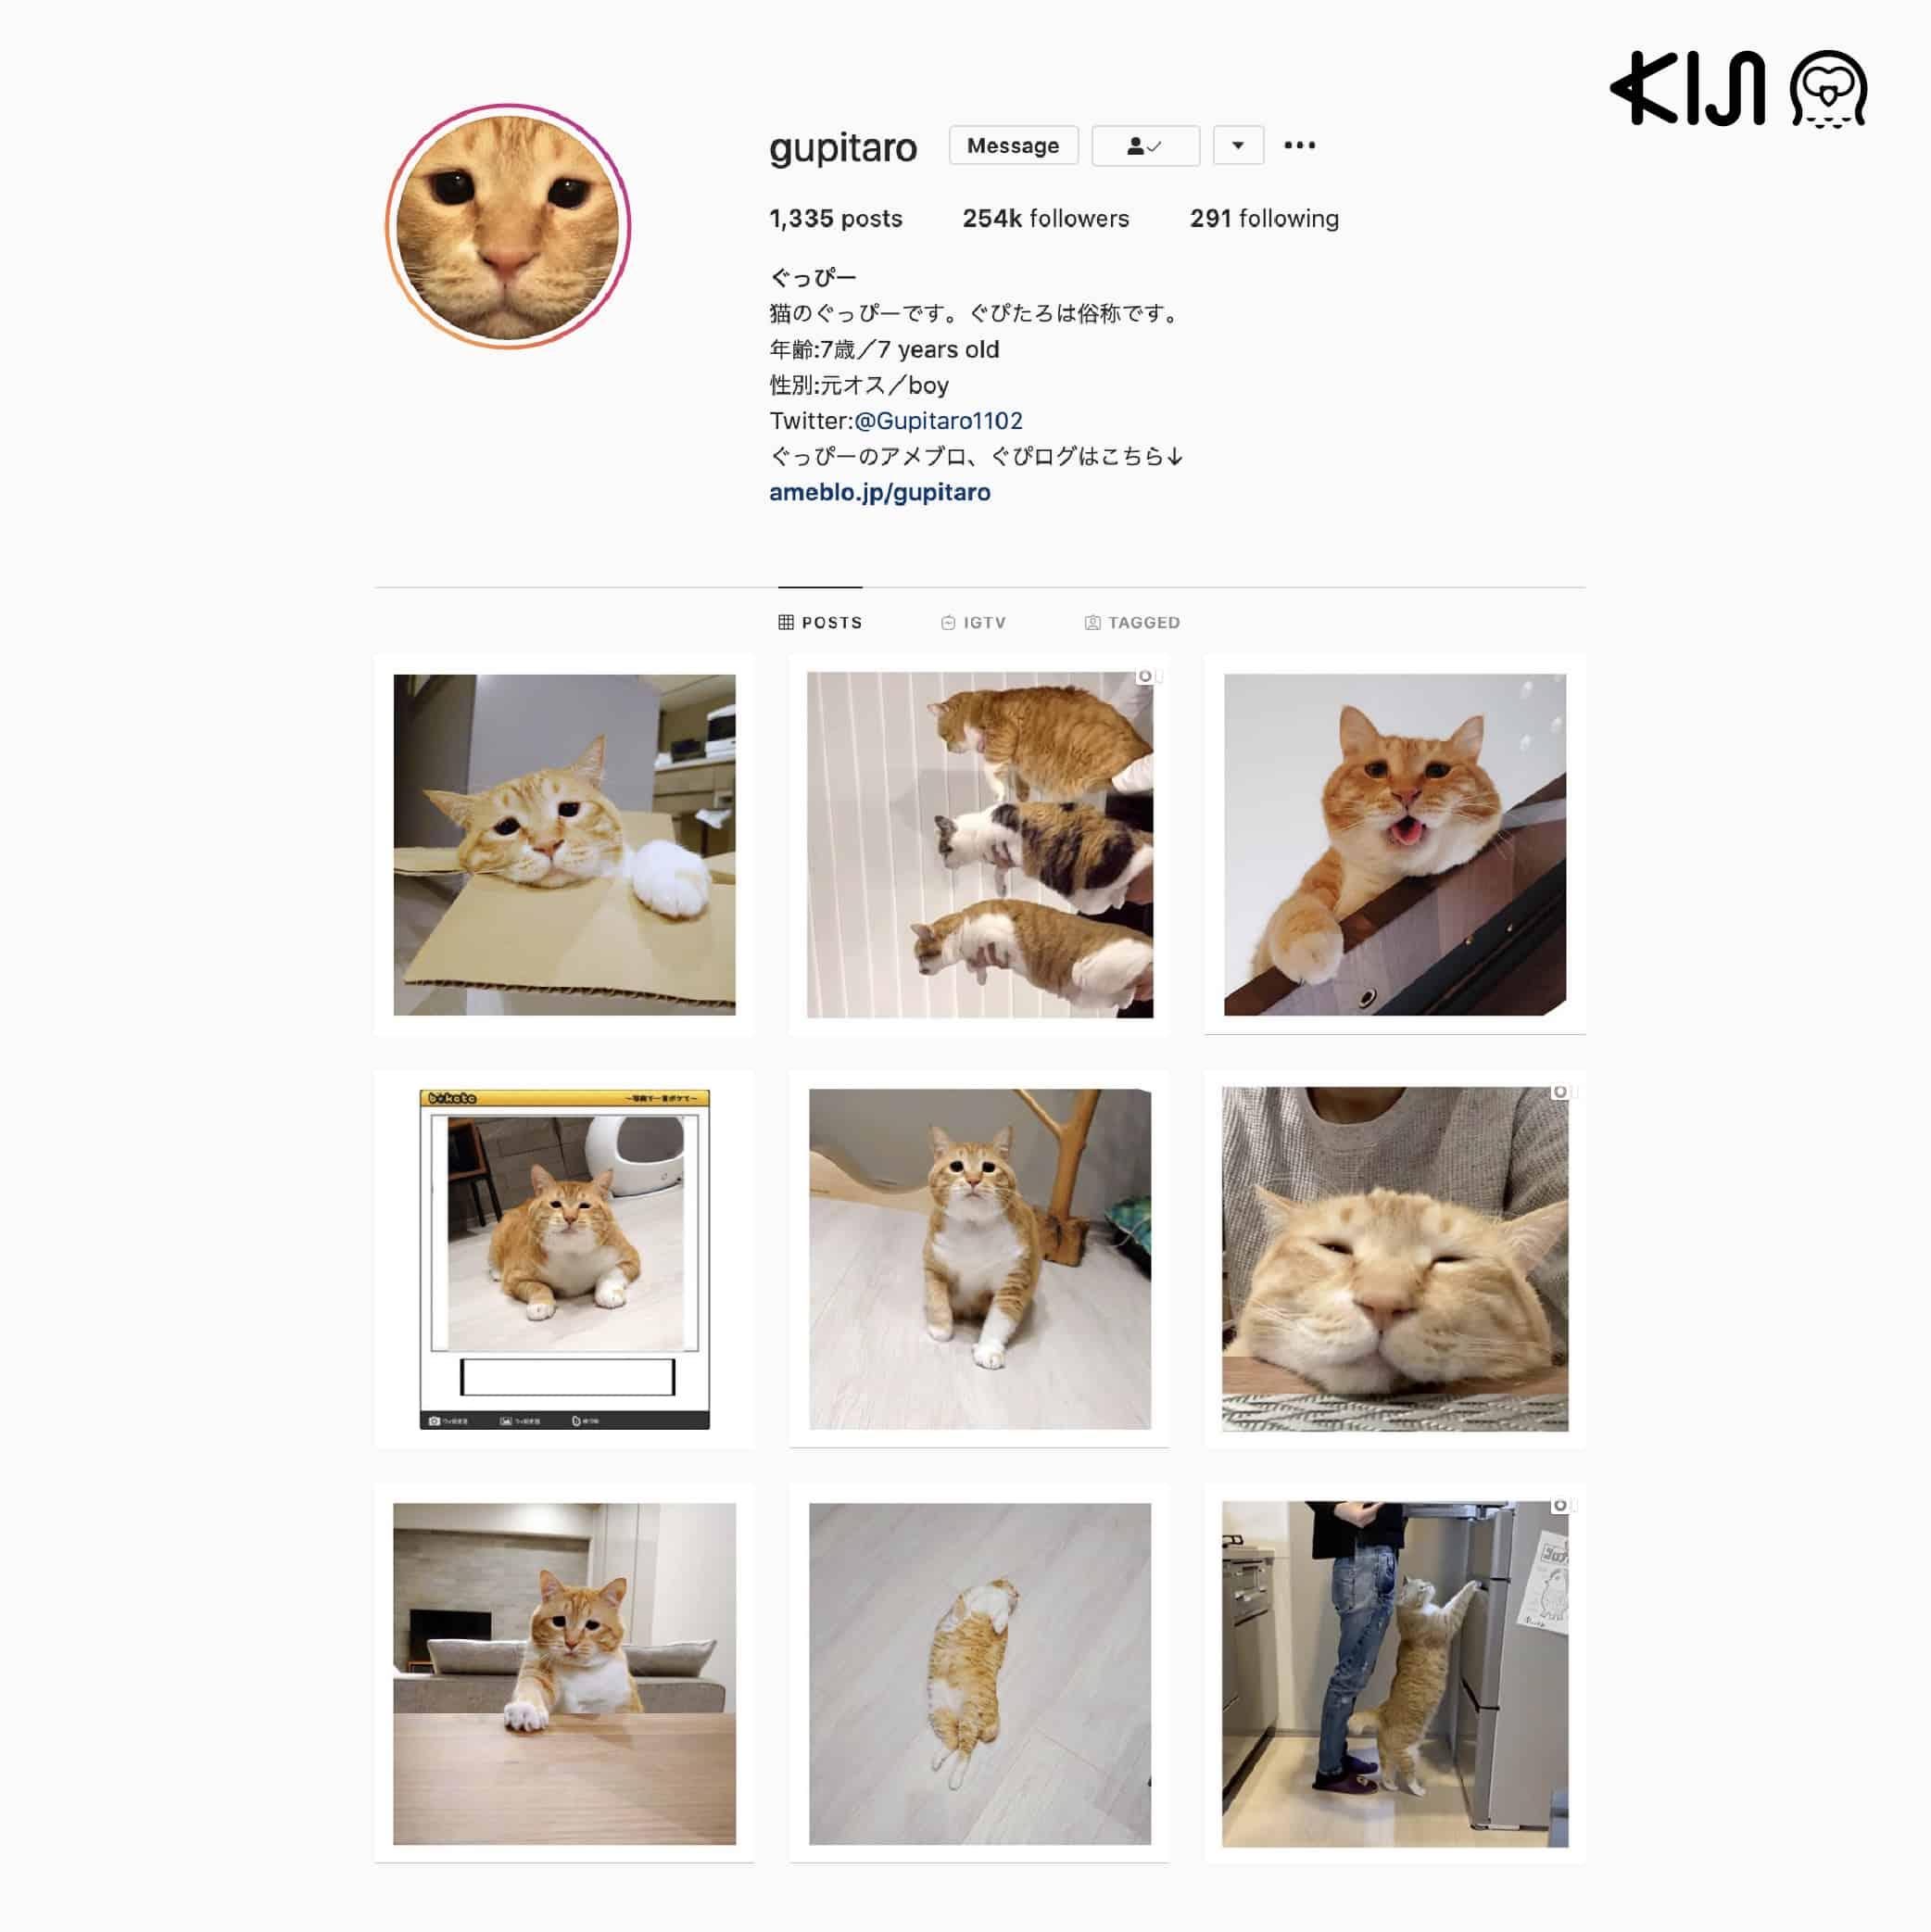 Gupitaro แมวตาละห้อยซึ่งเป็นที่รู้จักในหมู่ ทาสแมวญี่ปุ่น